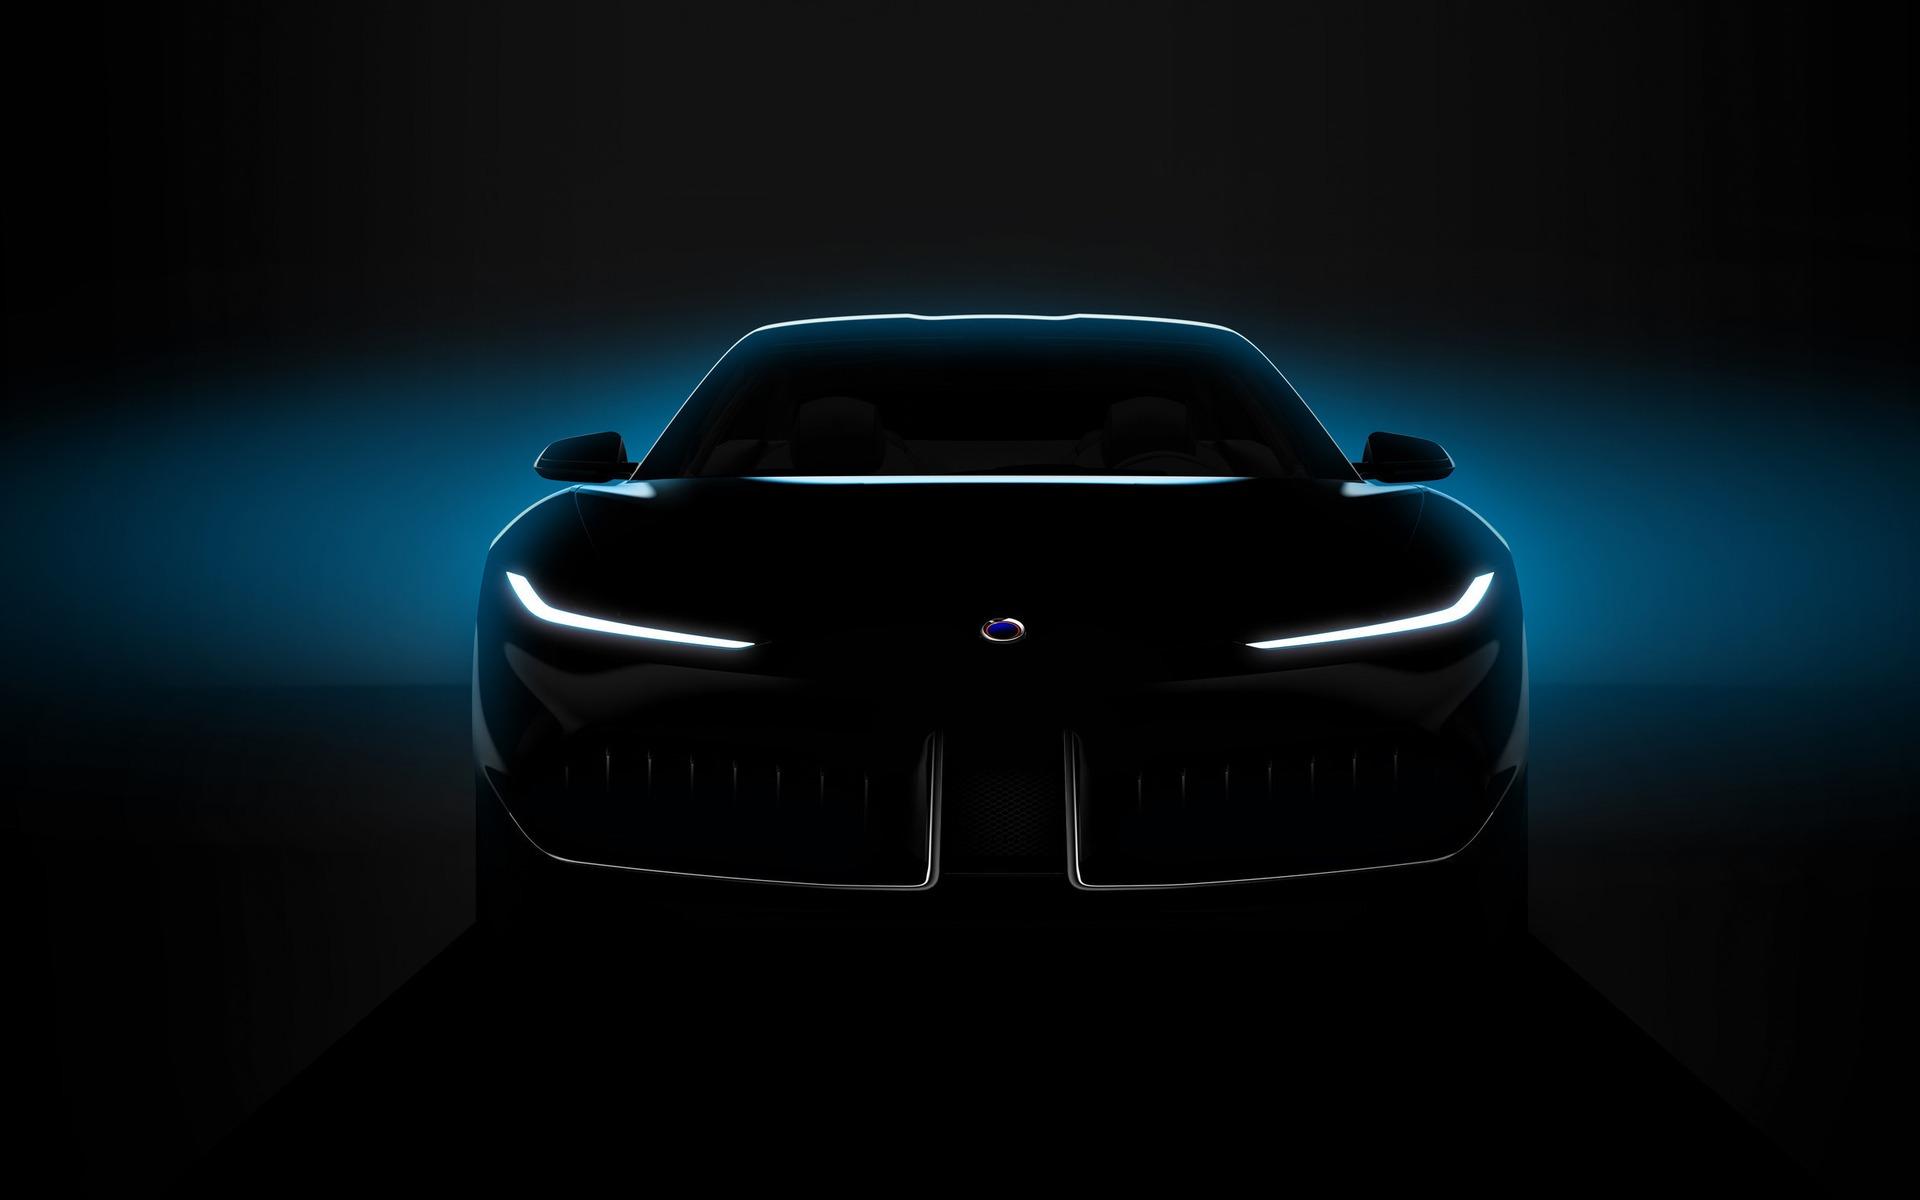 Upcoming Karma concept designed by Pininfarina